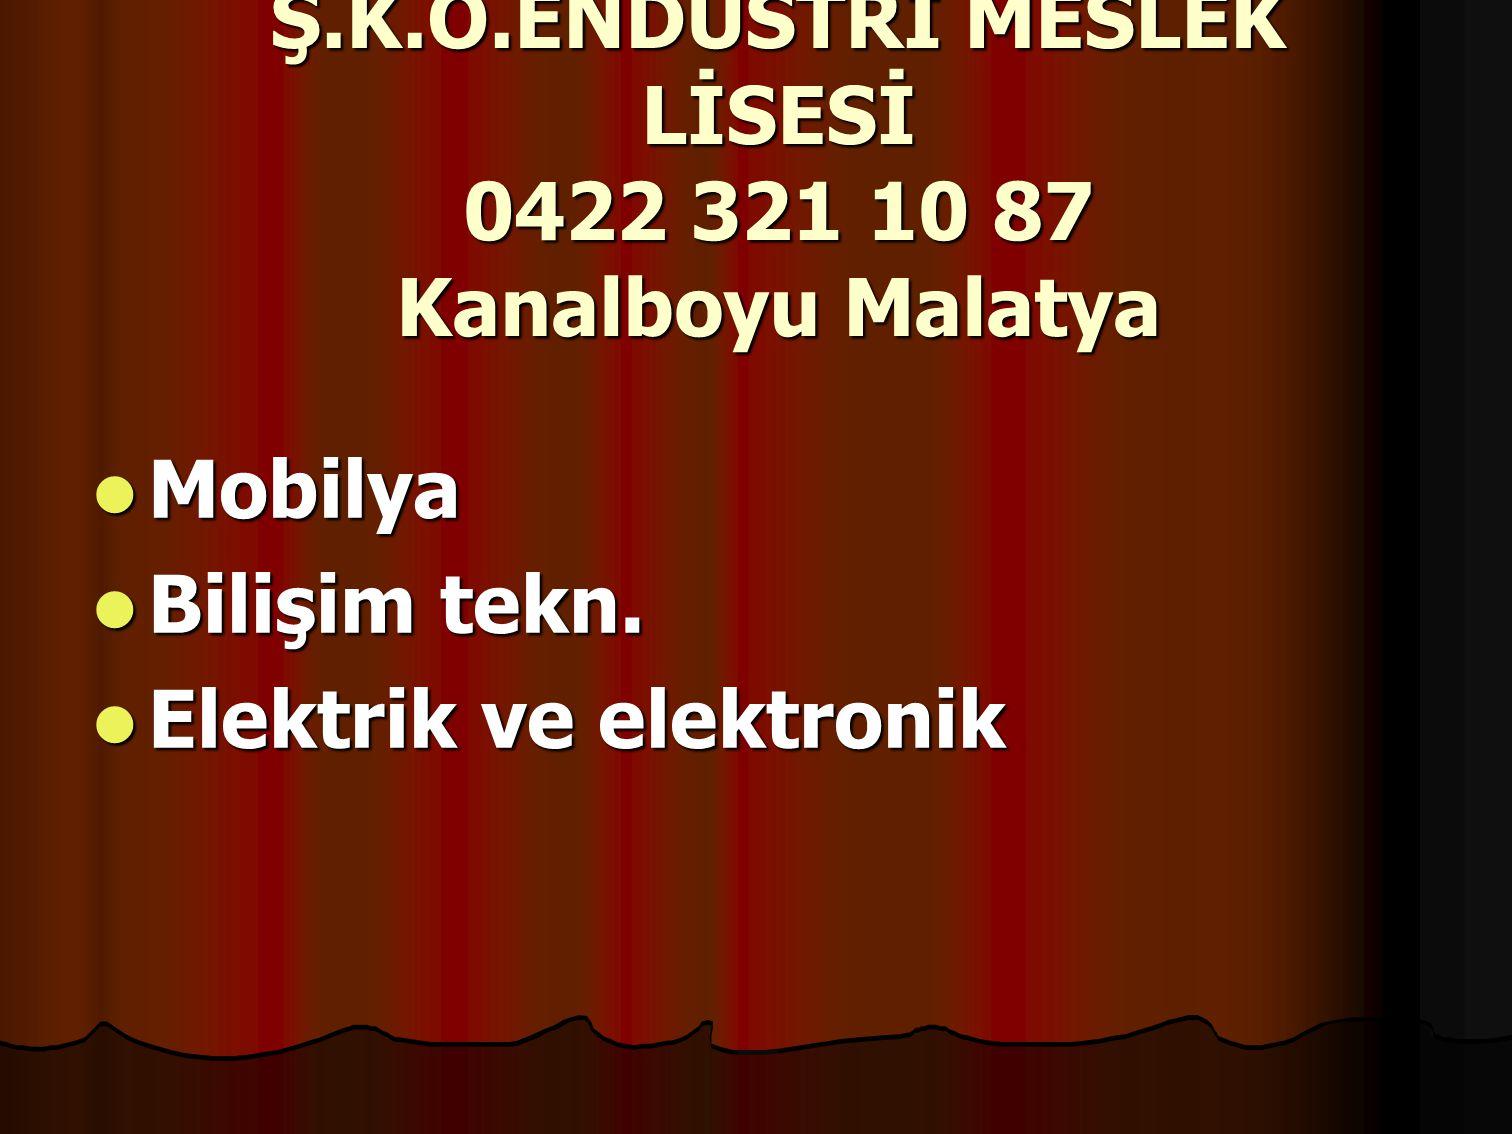 Ş.K.Ö.ENDÜSTRİ MESLEK LİSESİ 0422 321 10 87 Kanalboyu Malatya